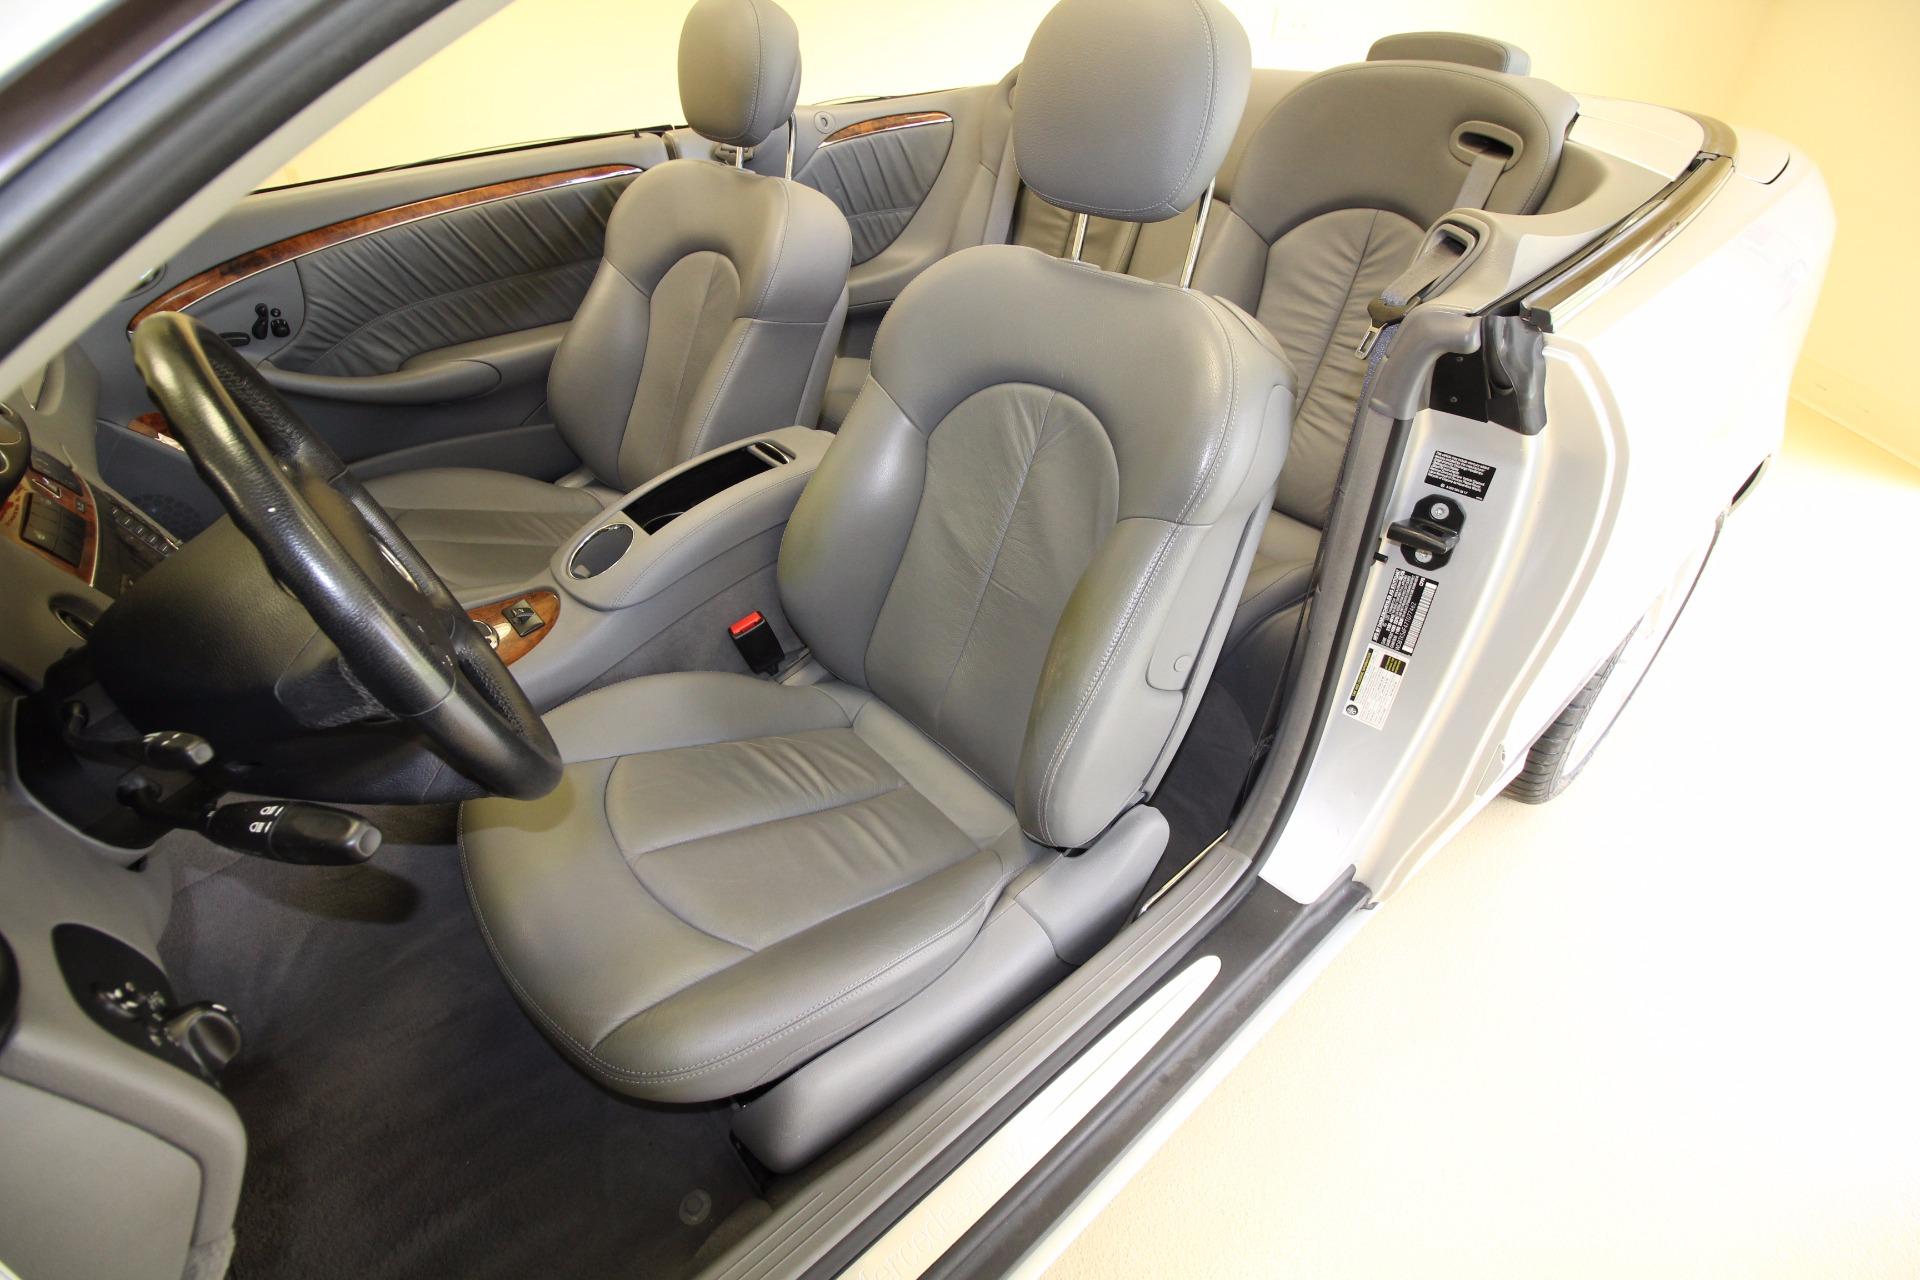 Used 2007 Mercedes-Benz CLK-Class CLK350 Cabriolet   Albany, NY